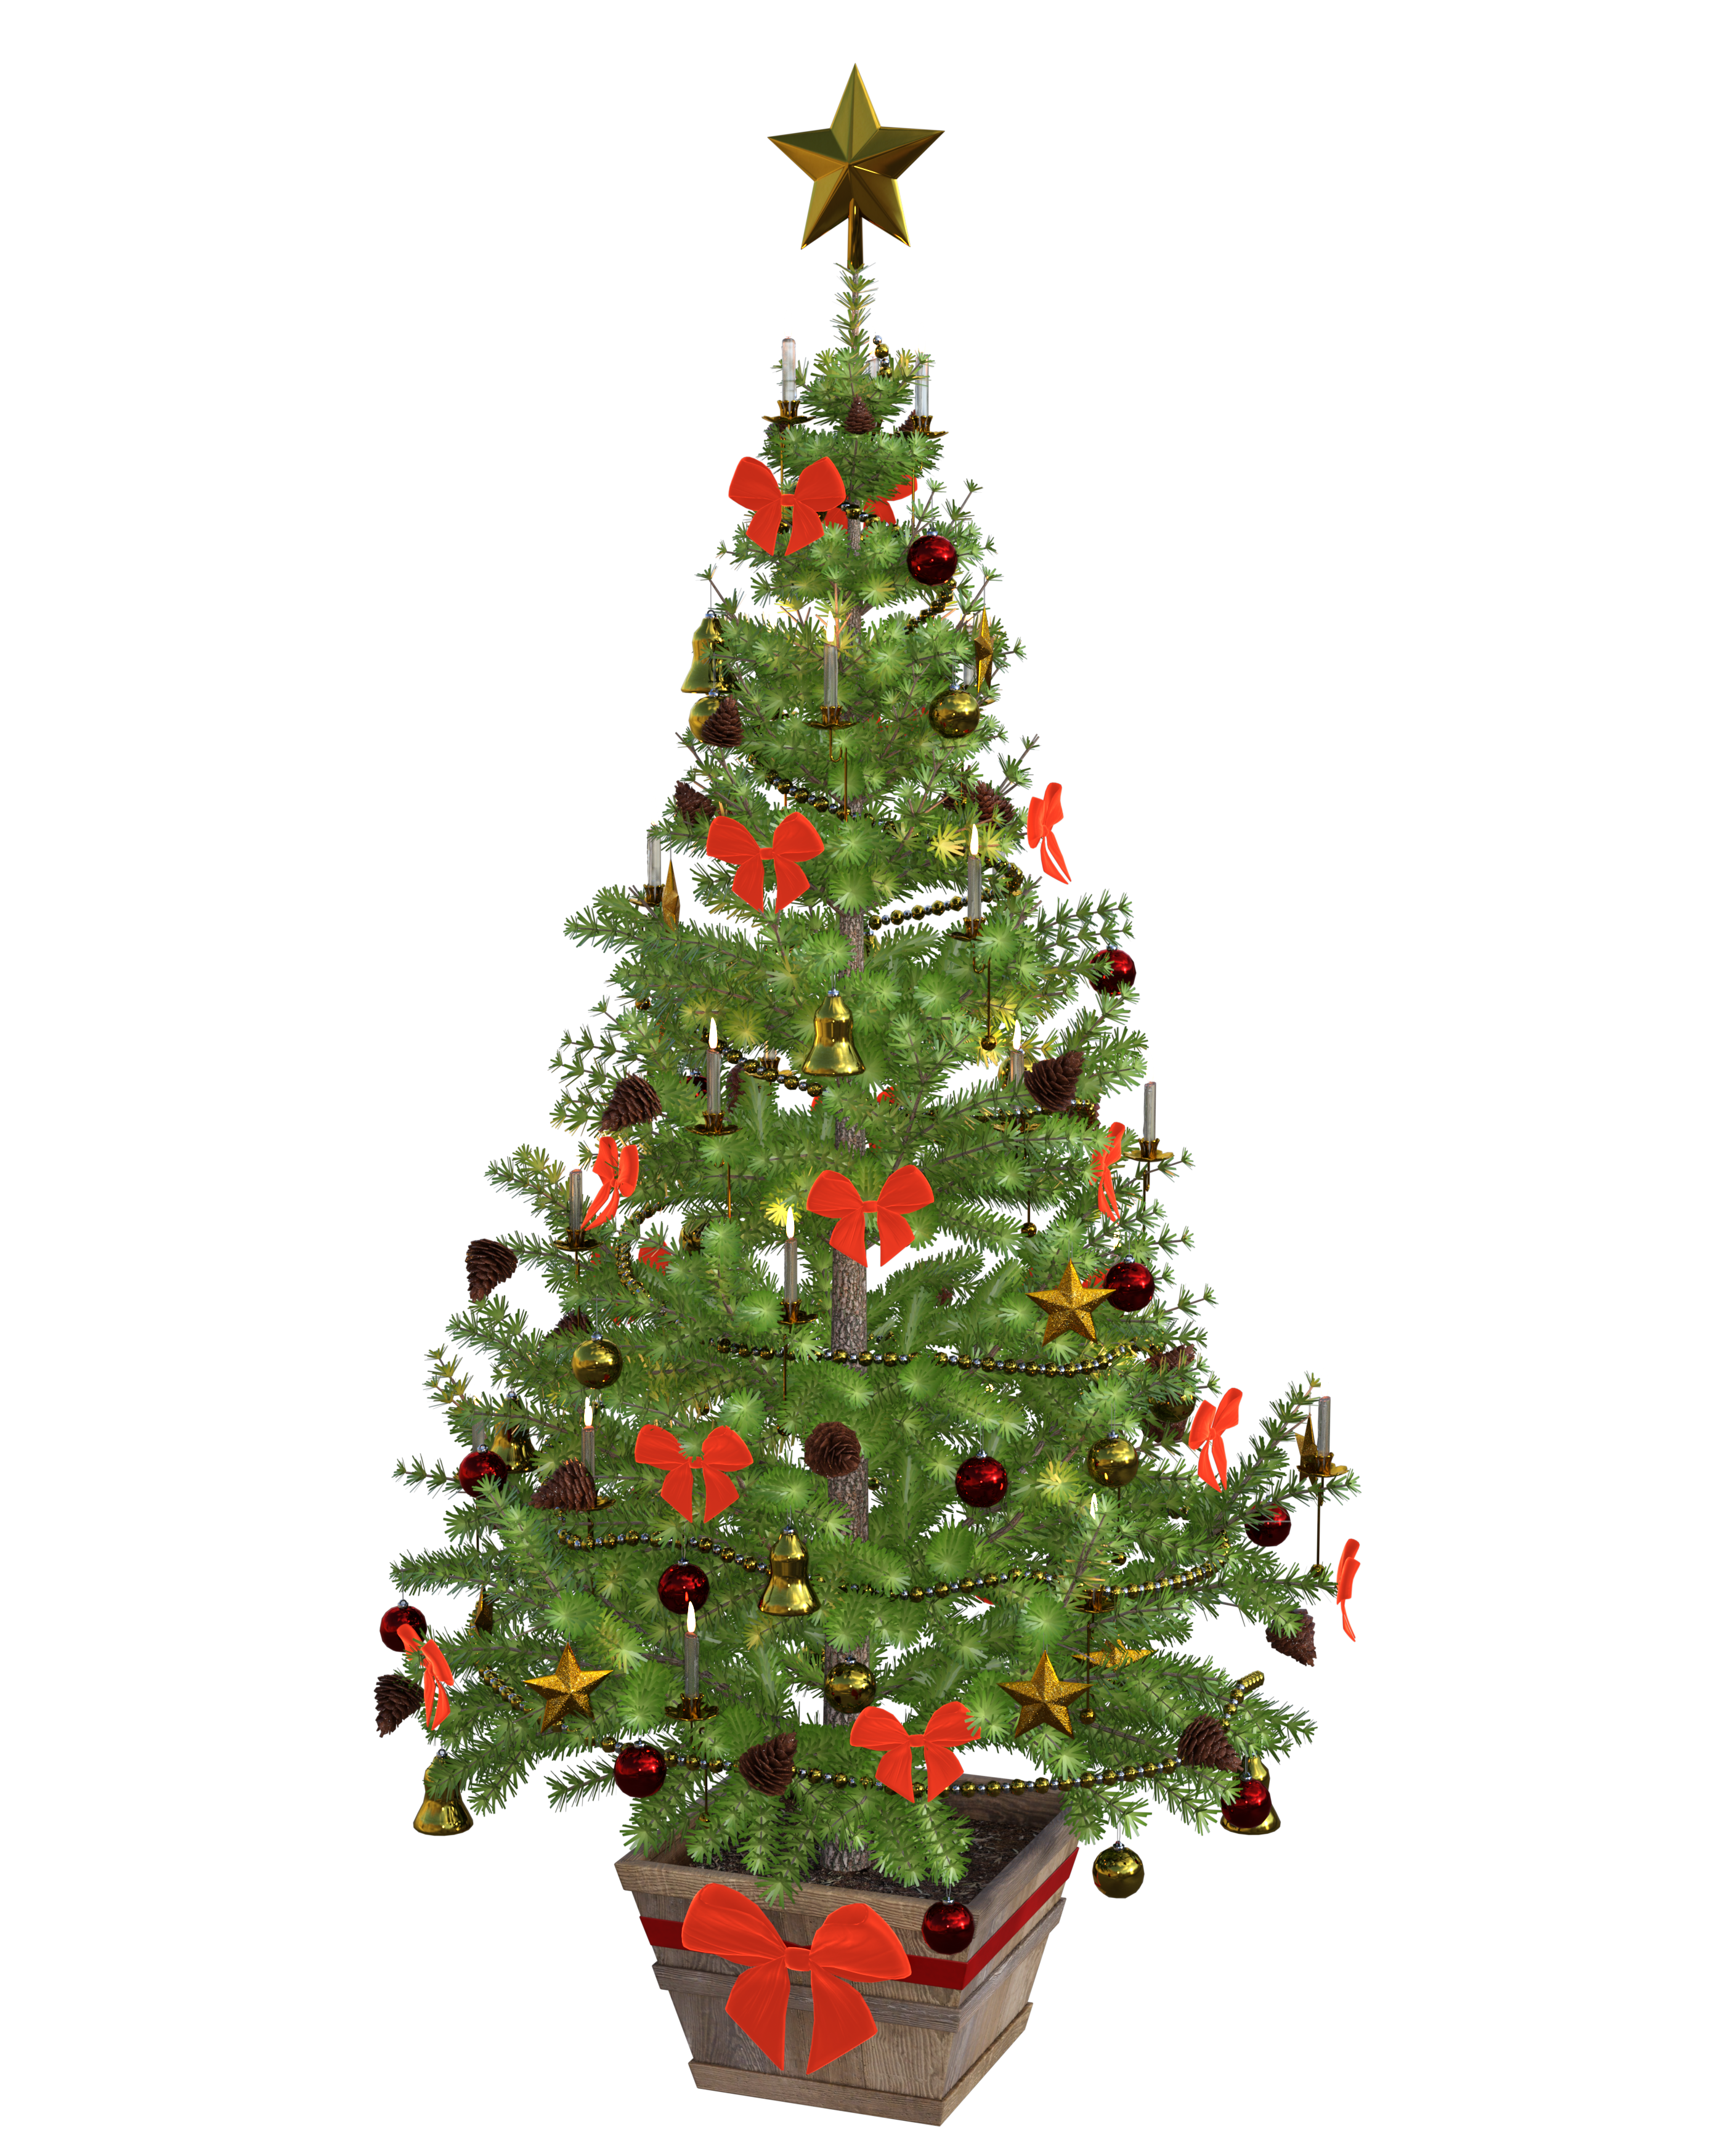 Christmas Model.Christmas Tree 3d Model Image Free Stock Photo Public